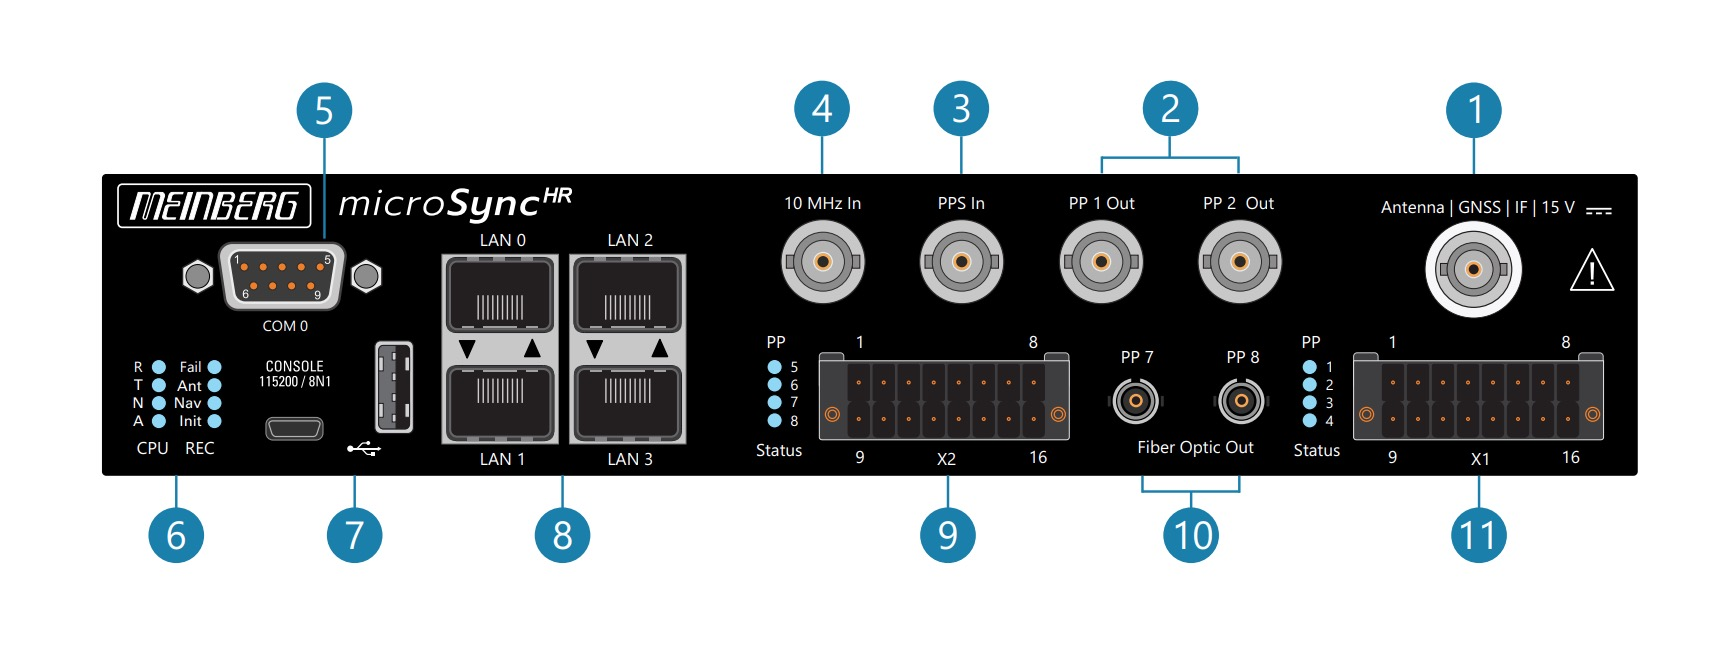 microSync HR Serie 311